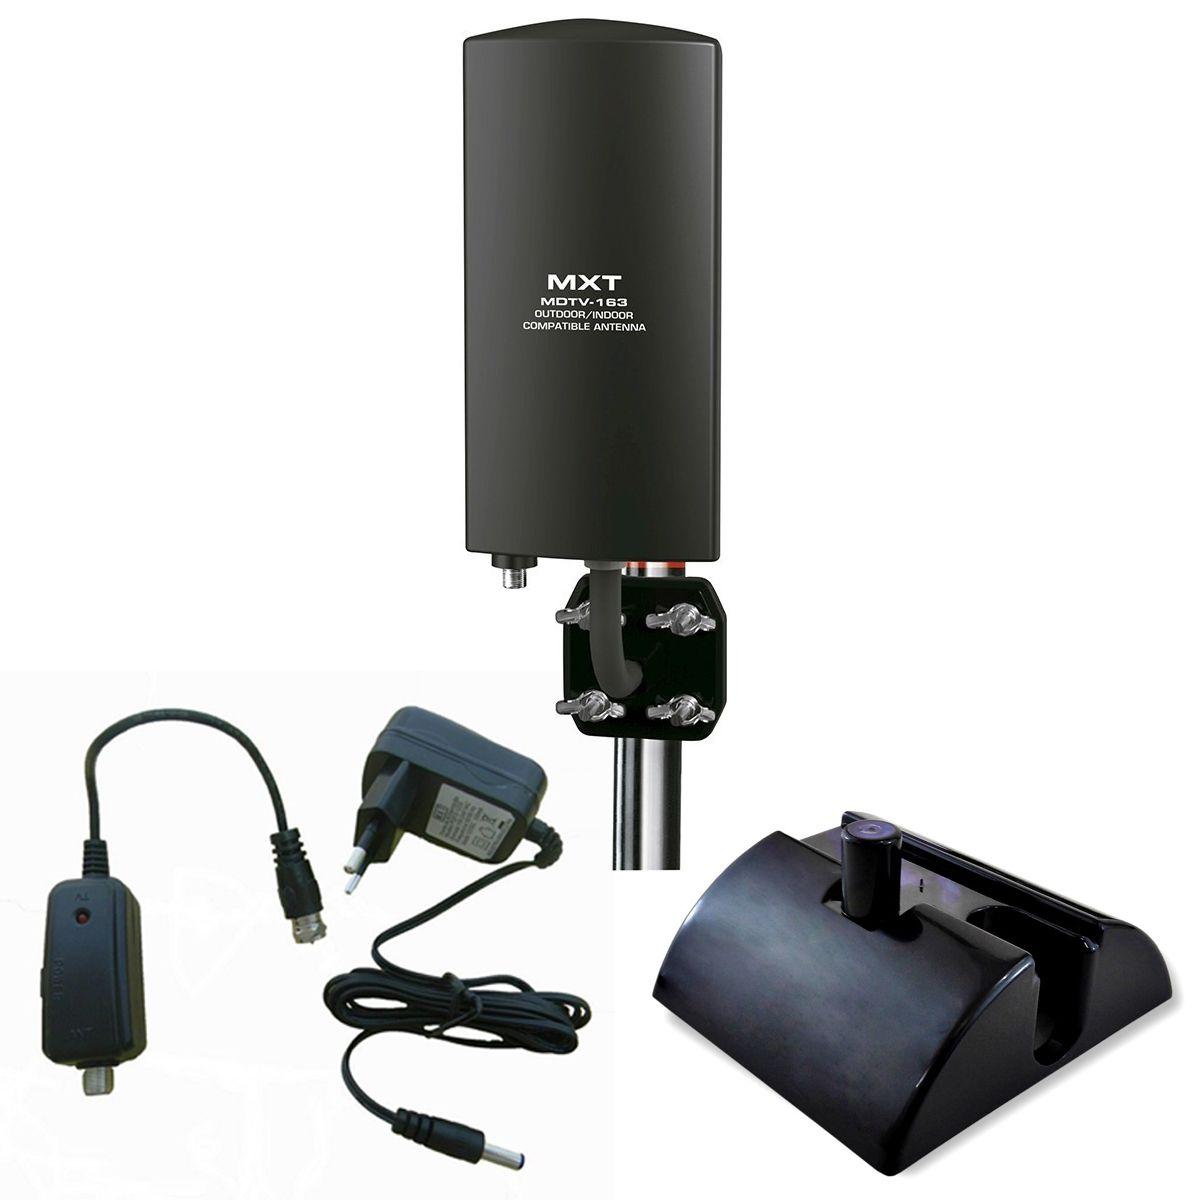 Antena Amplificada UHF/VHF/HDTV Interna 25db  MDTV 163  - EMPORIO K